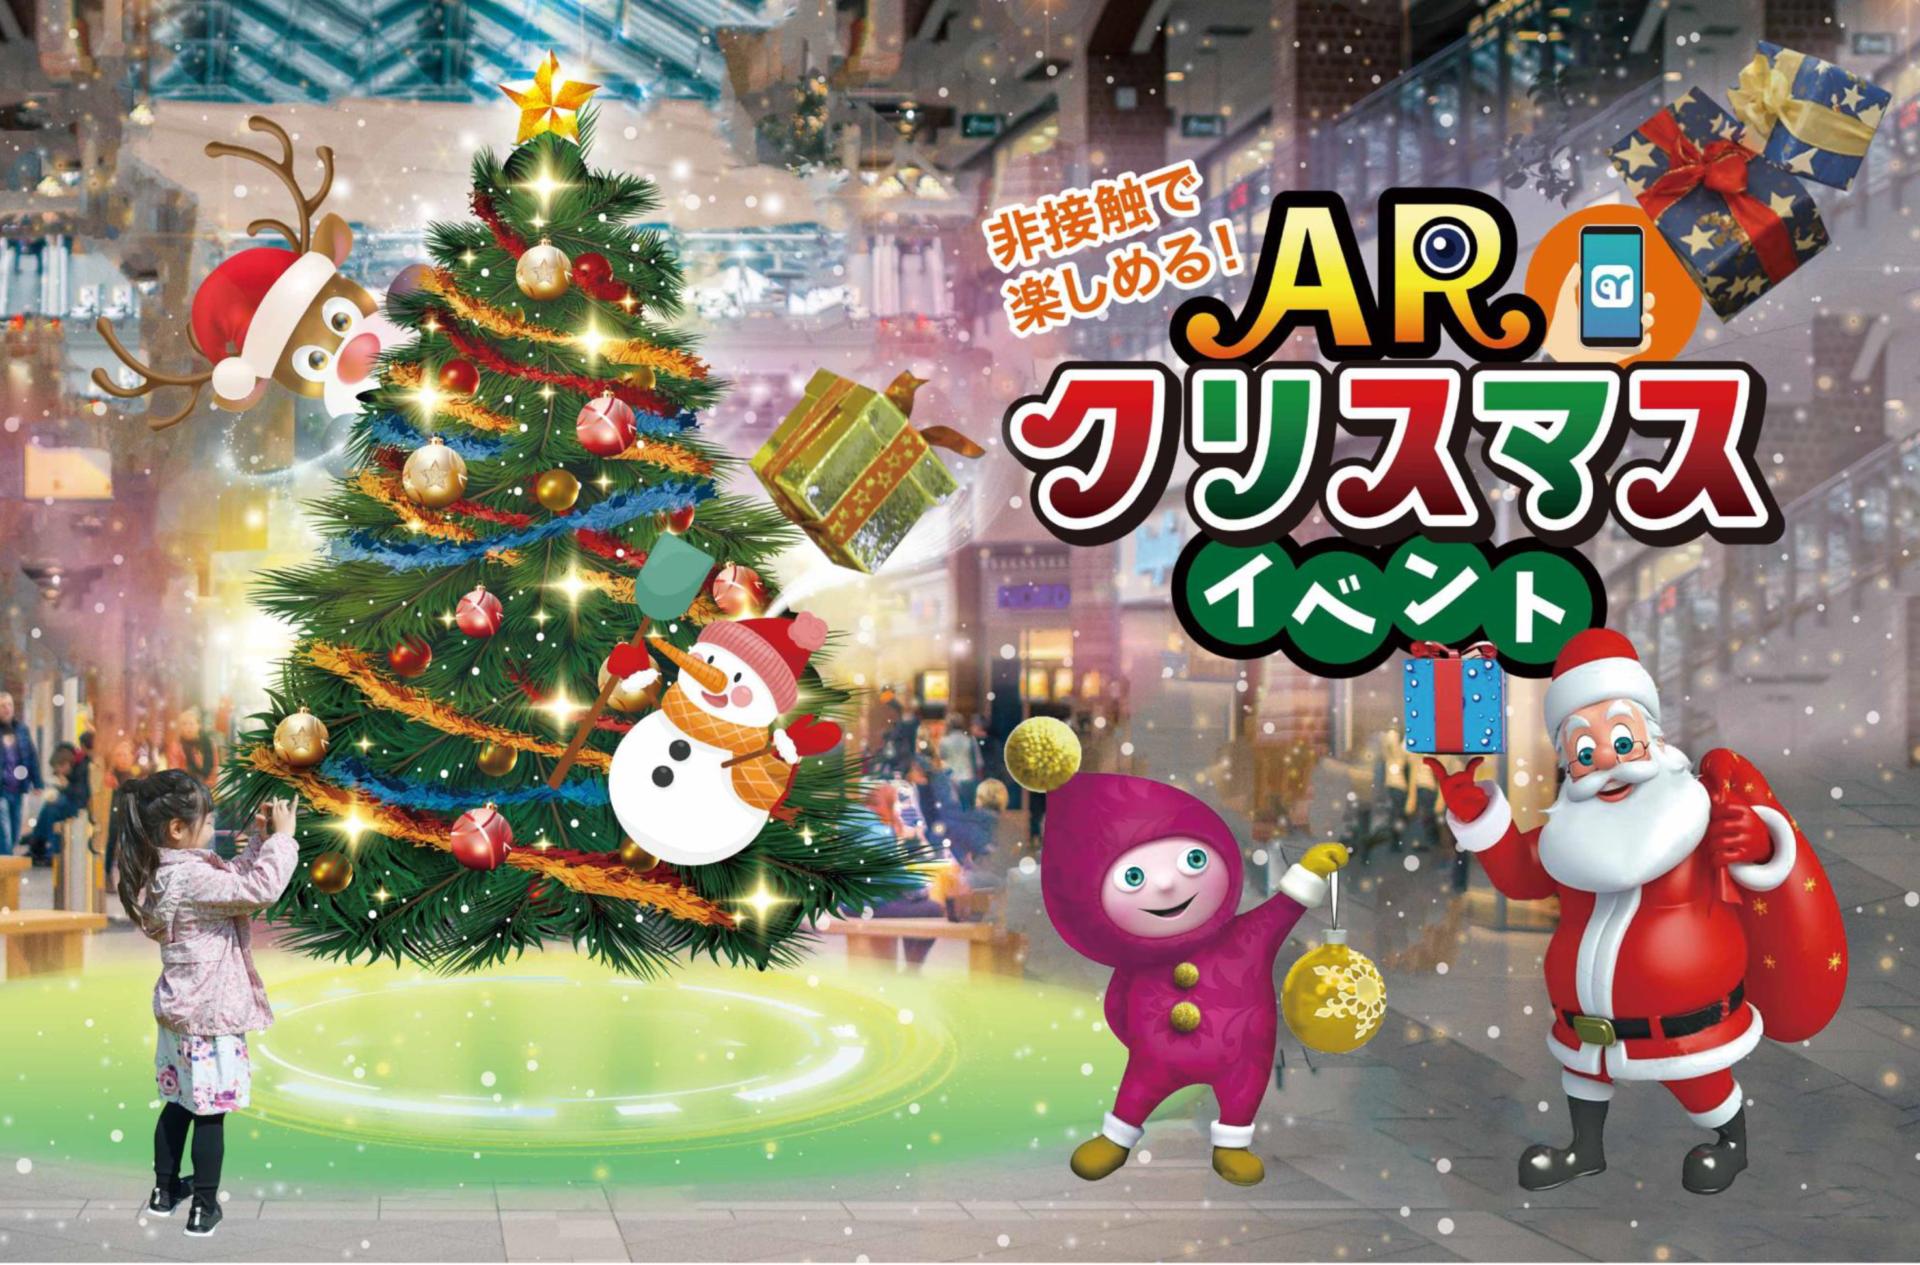 ARクリスマスイベント表紙